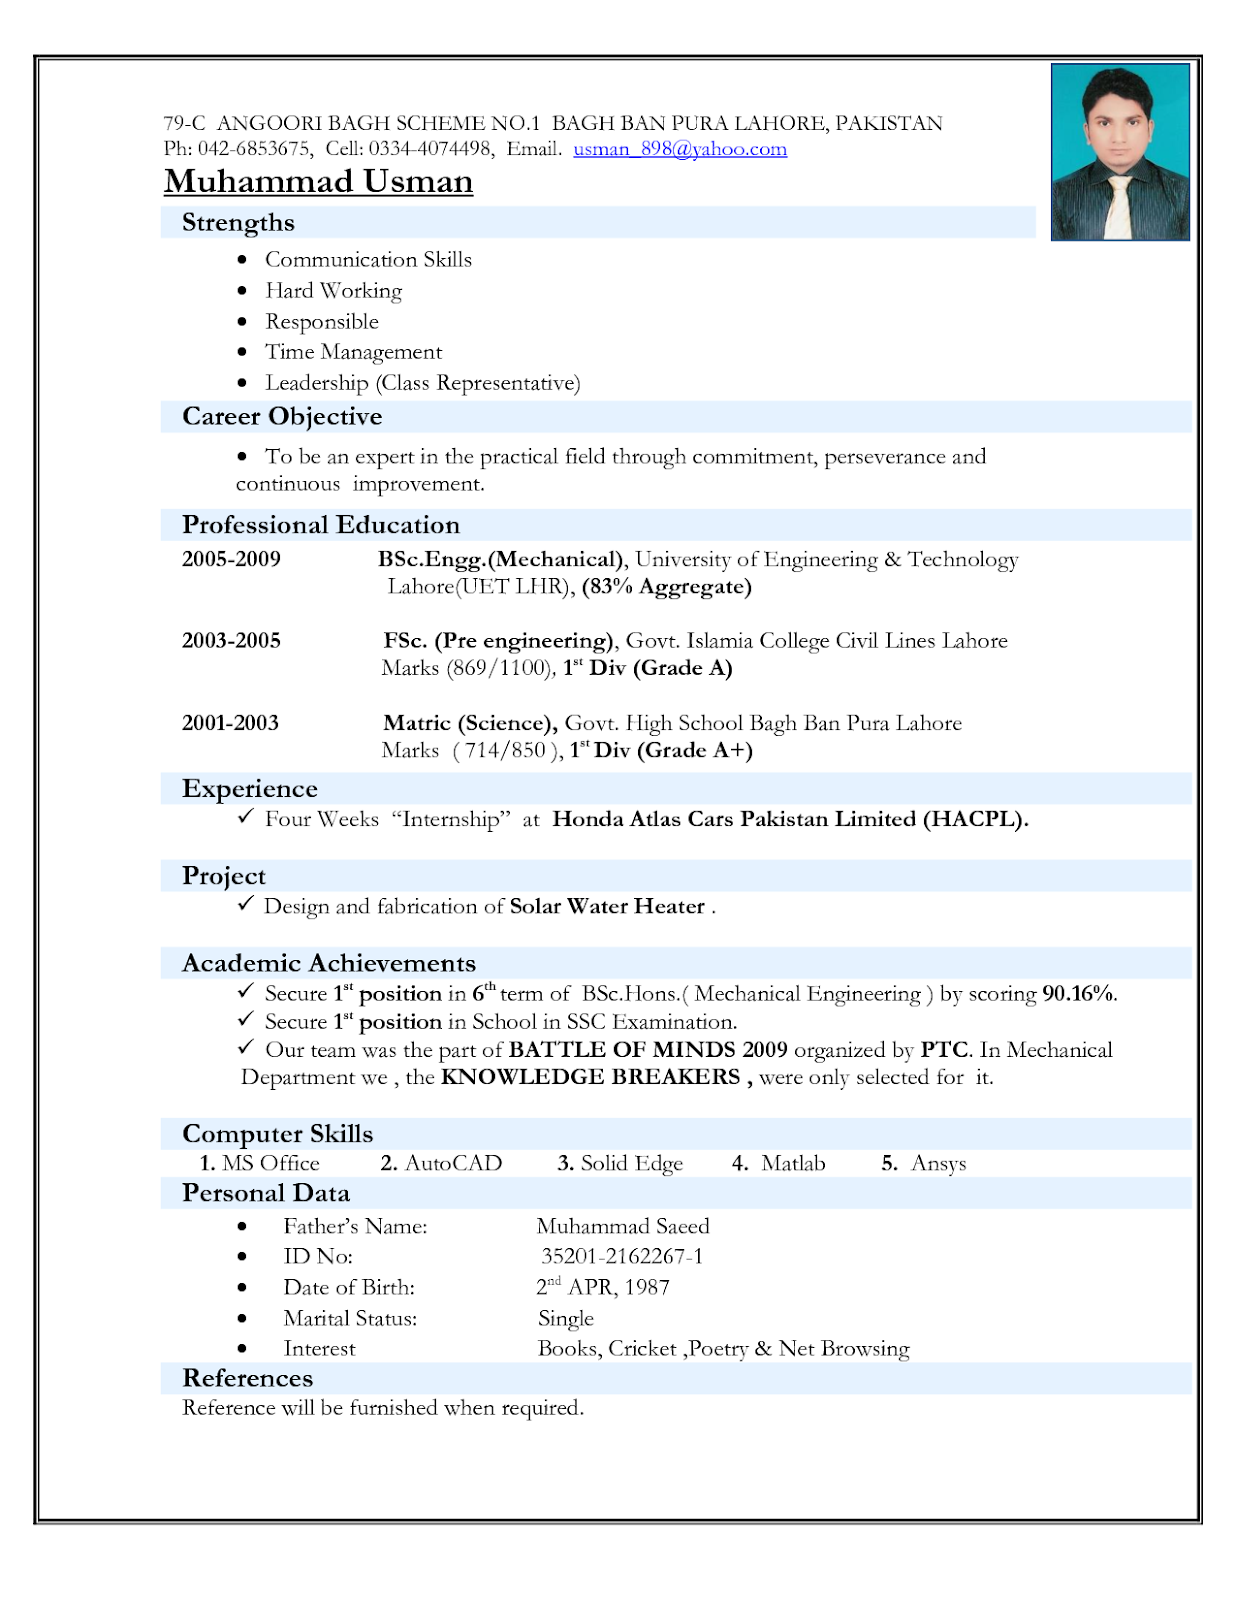 Mechanical Engineering Cv Format Mechanical Engineering Cv Format For Fresher Pdf Mechani Resume Format Download Resume Format For Freshers Job Resume Format